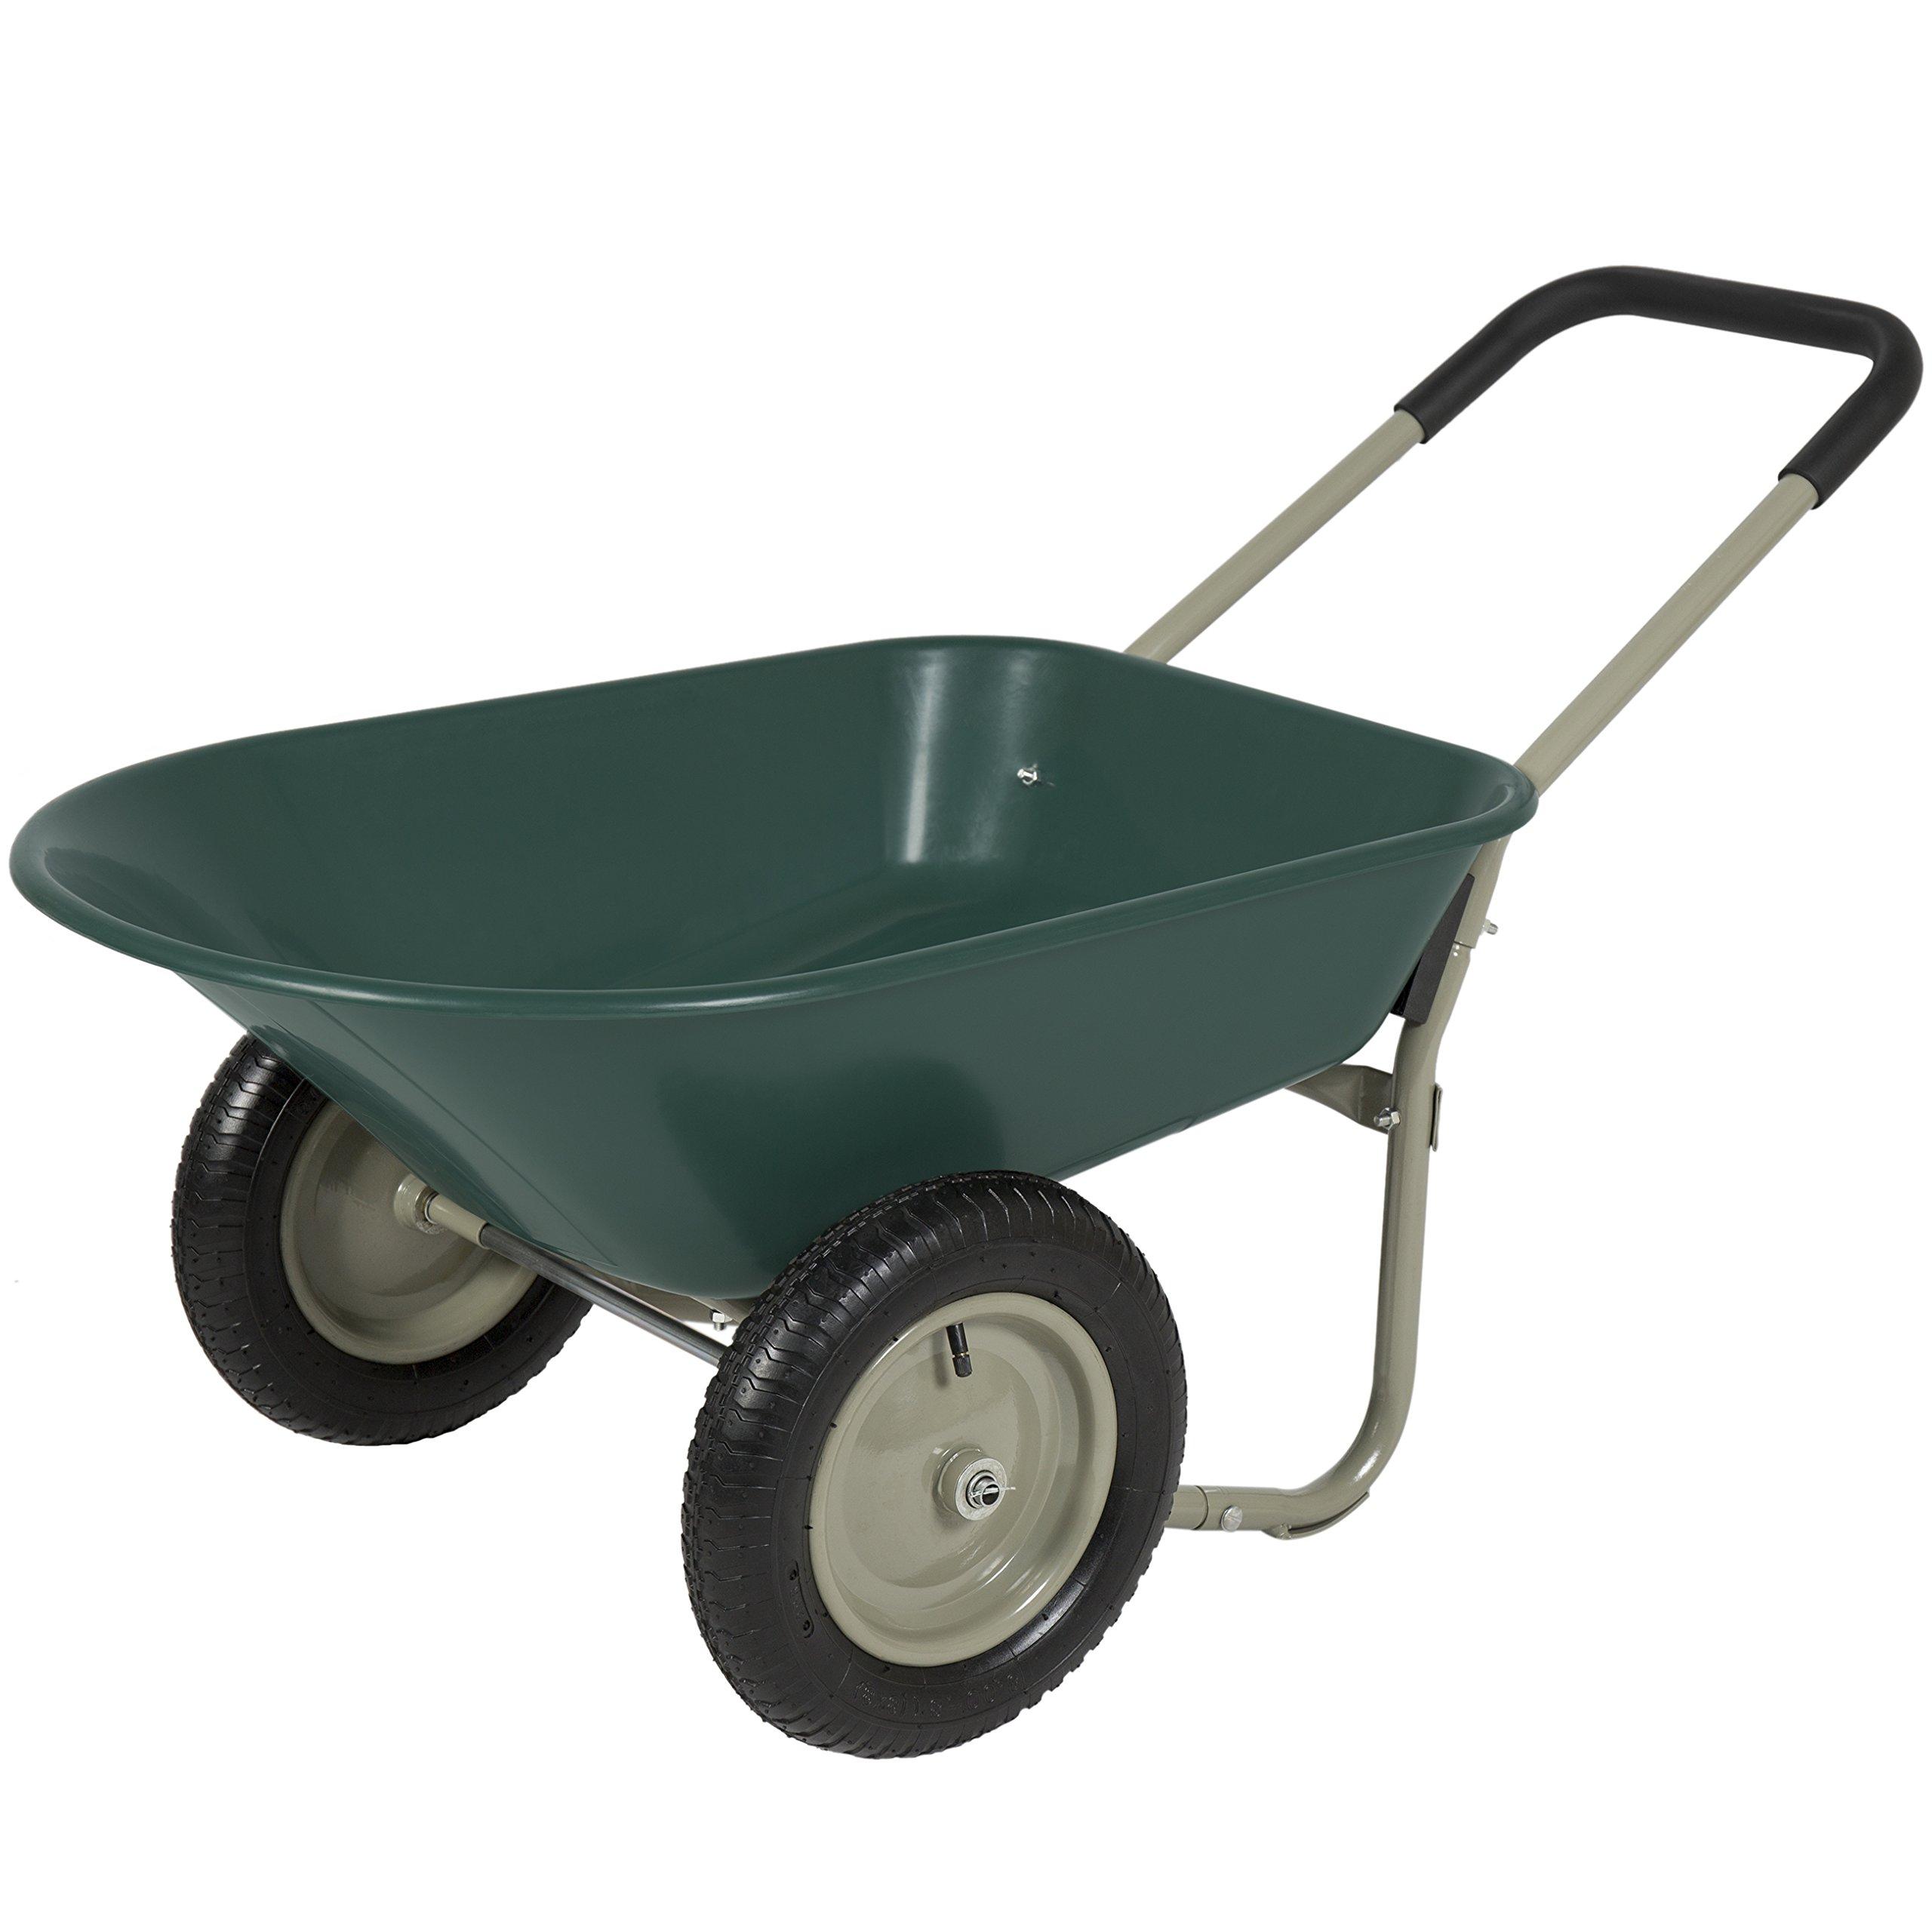 Best Choice Products Dual Wheel Home Wheelbarrow Yard Garden Cart by Best Choice Products